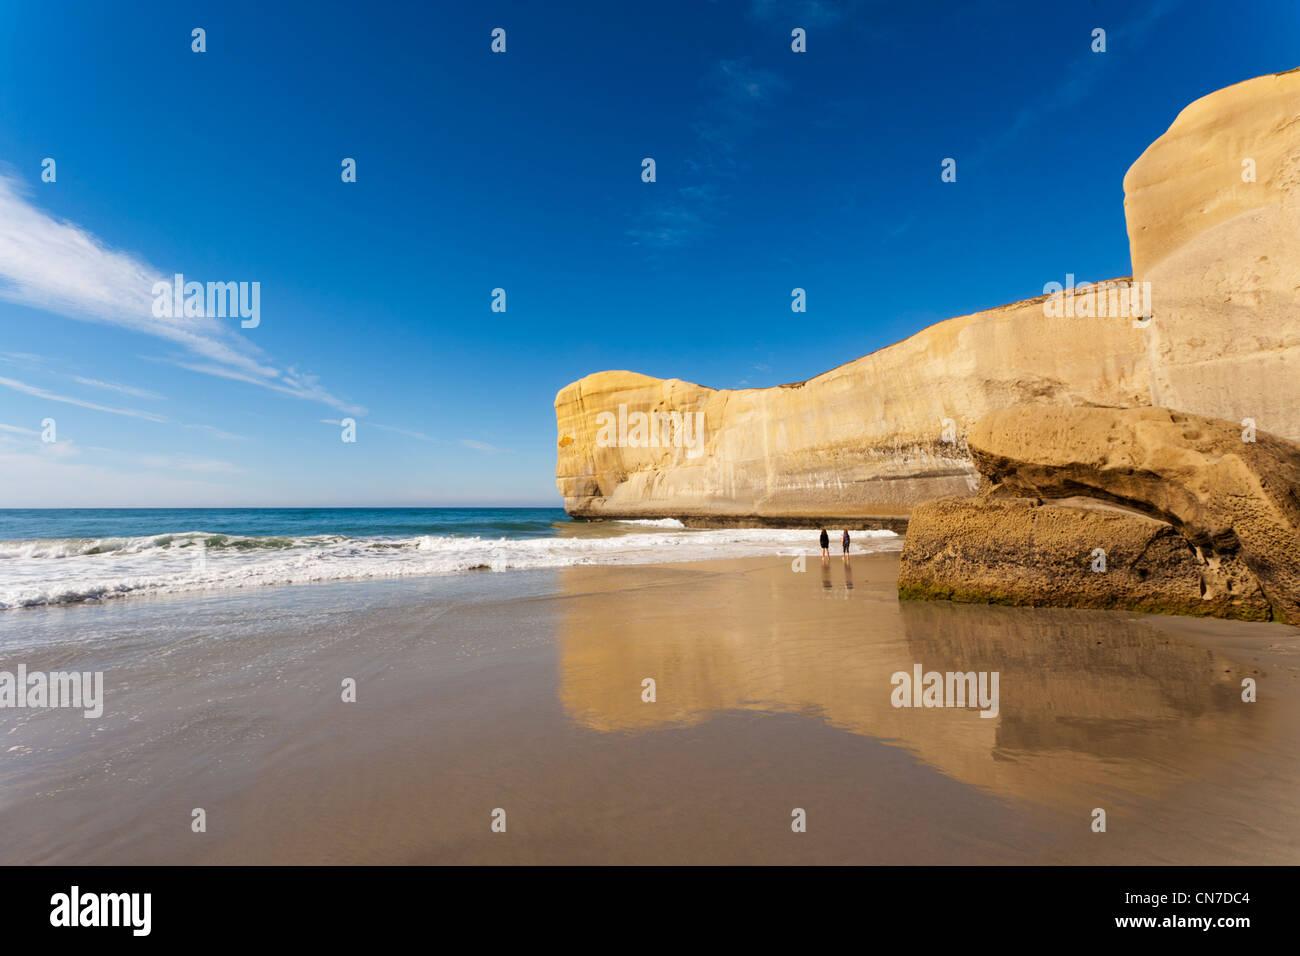 Túnel de Otago, Dunedin, playa, dos niñas de pie en la playa. Foto de stock